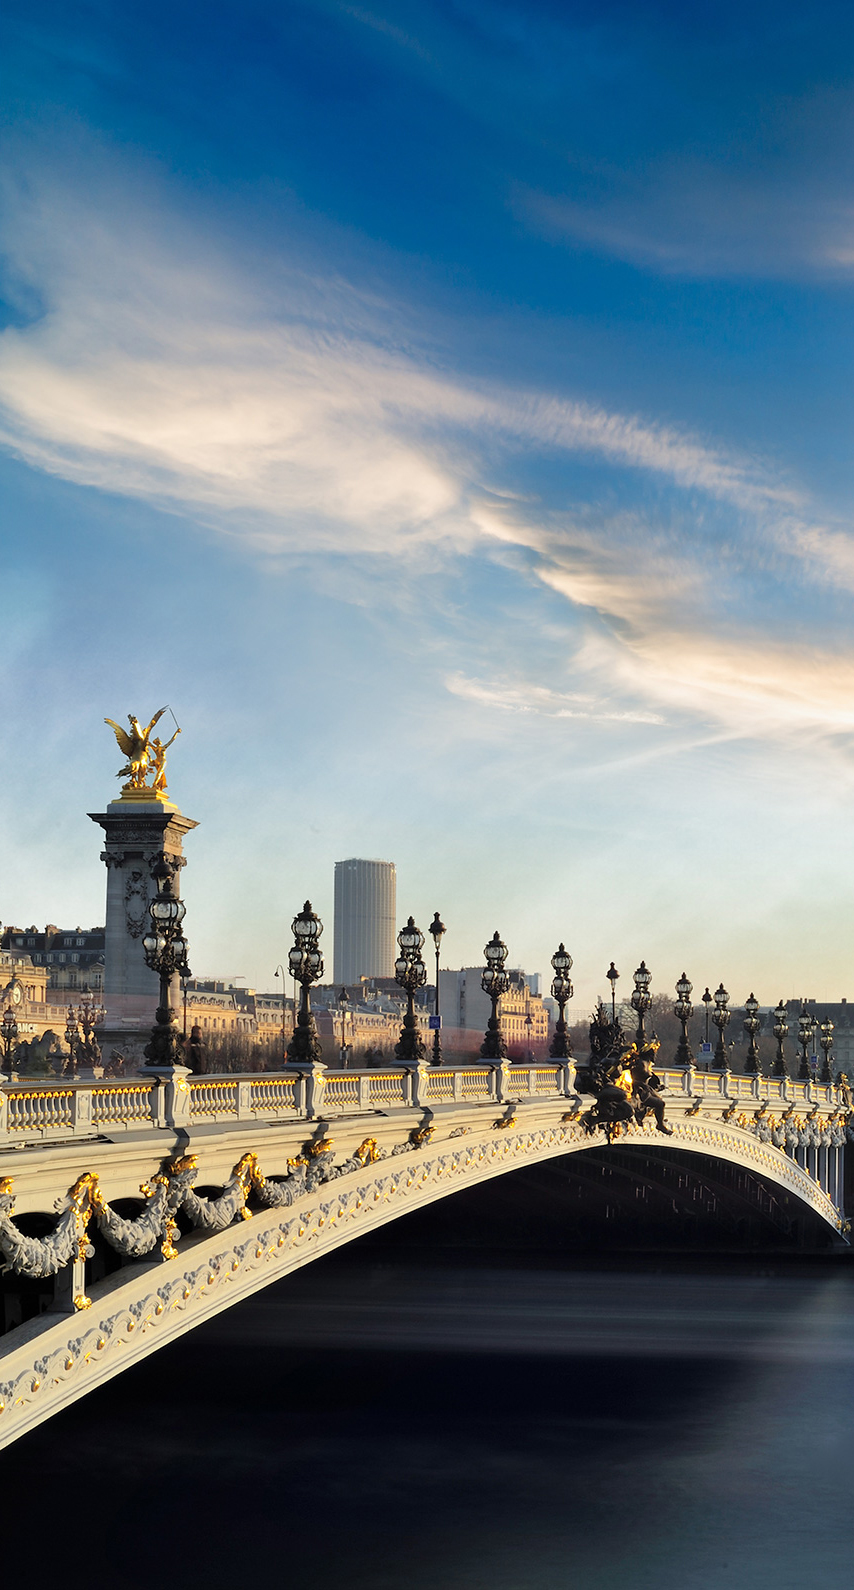 dawn, dusk, outdoors, architecture, building, tower, cityscape, landmark